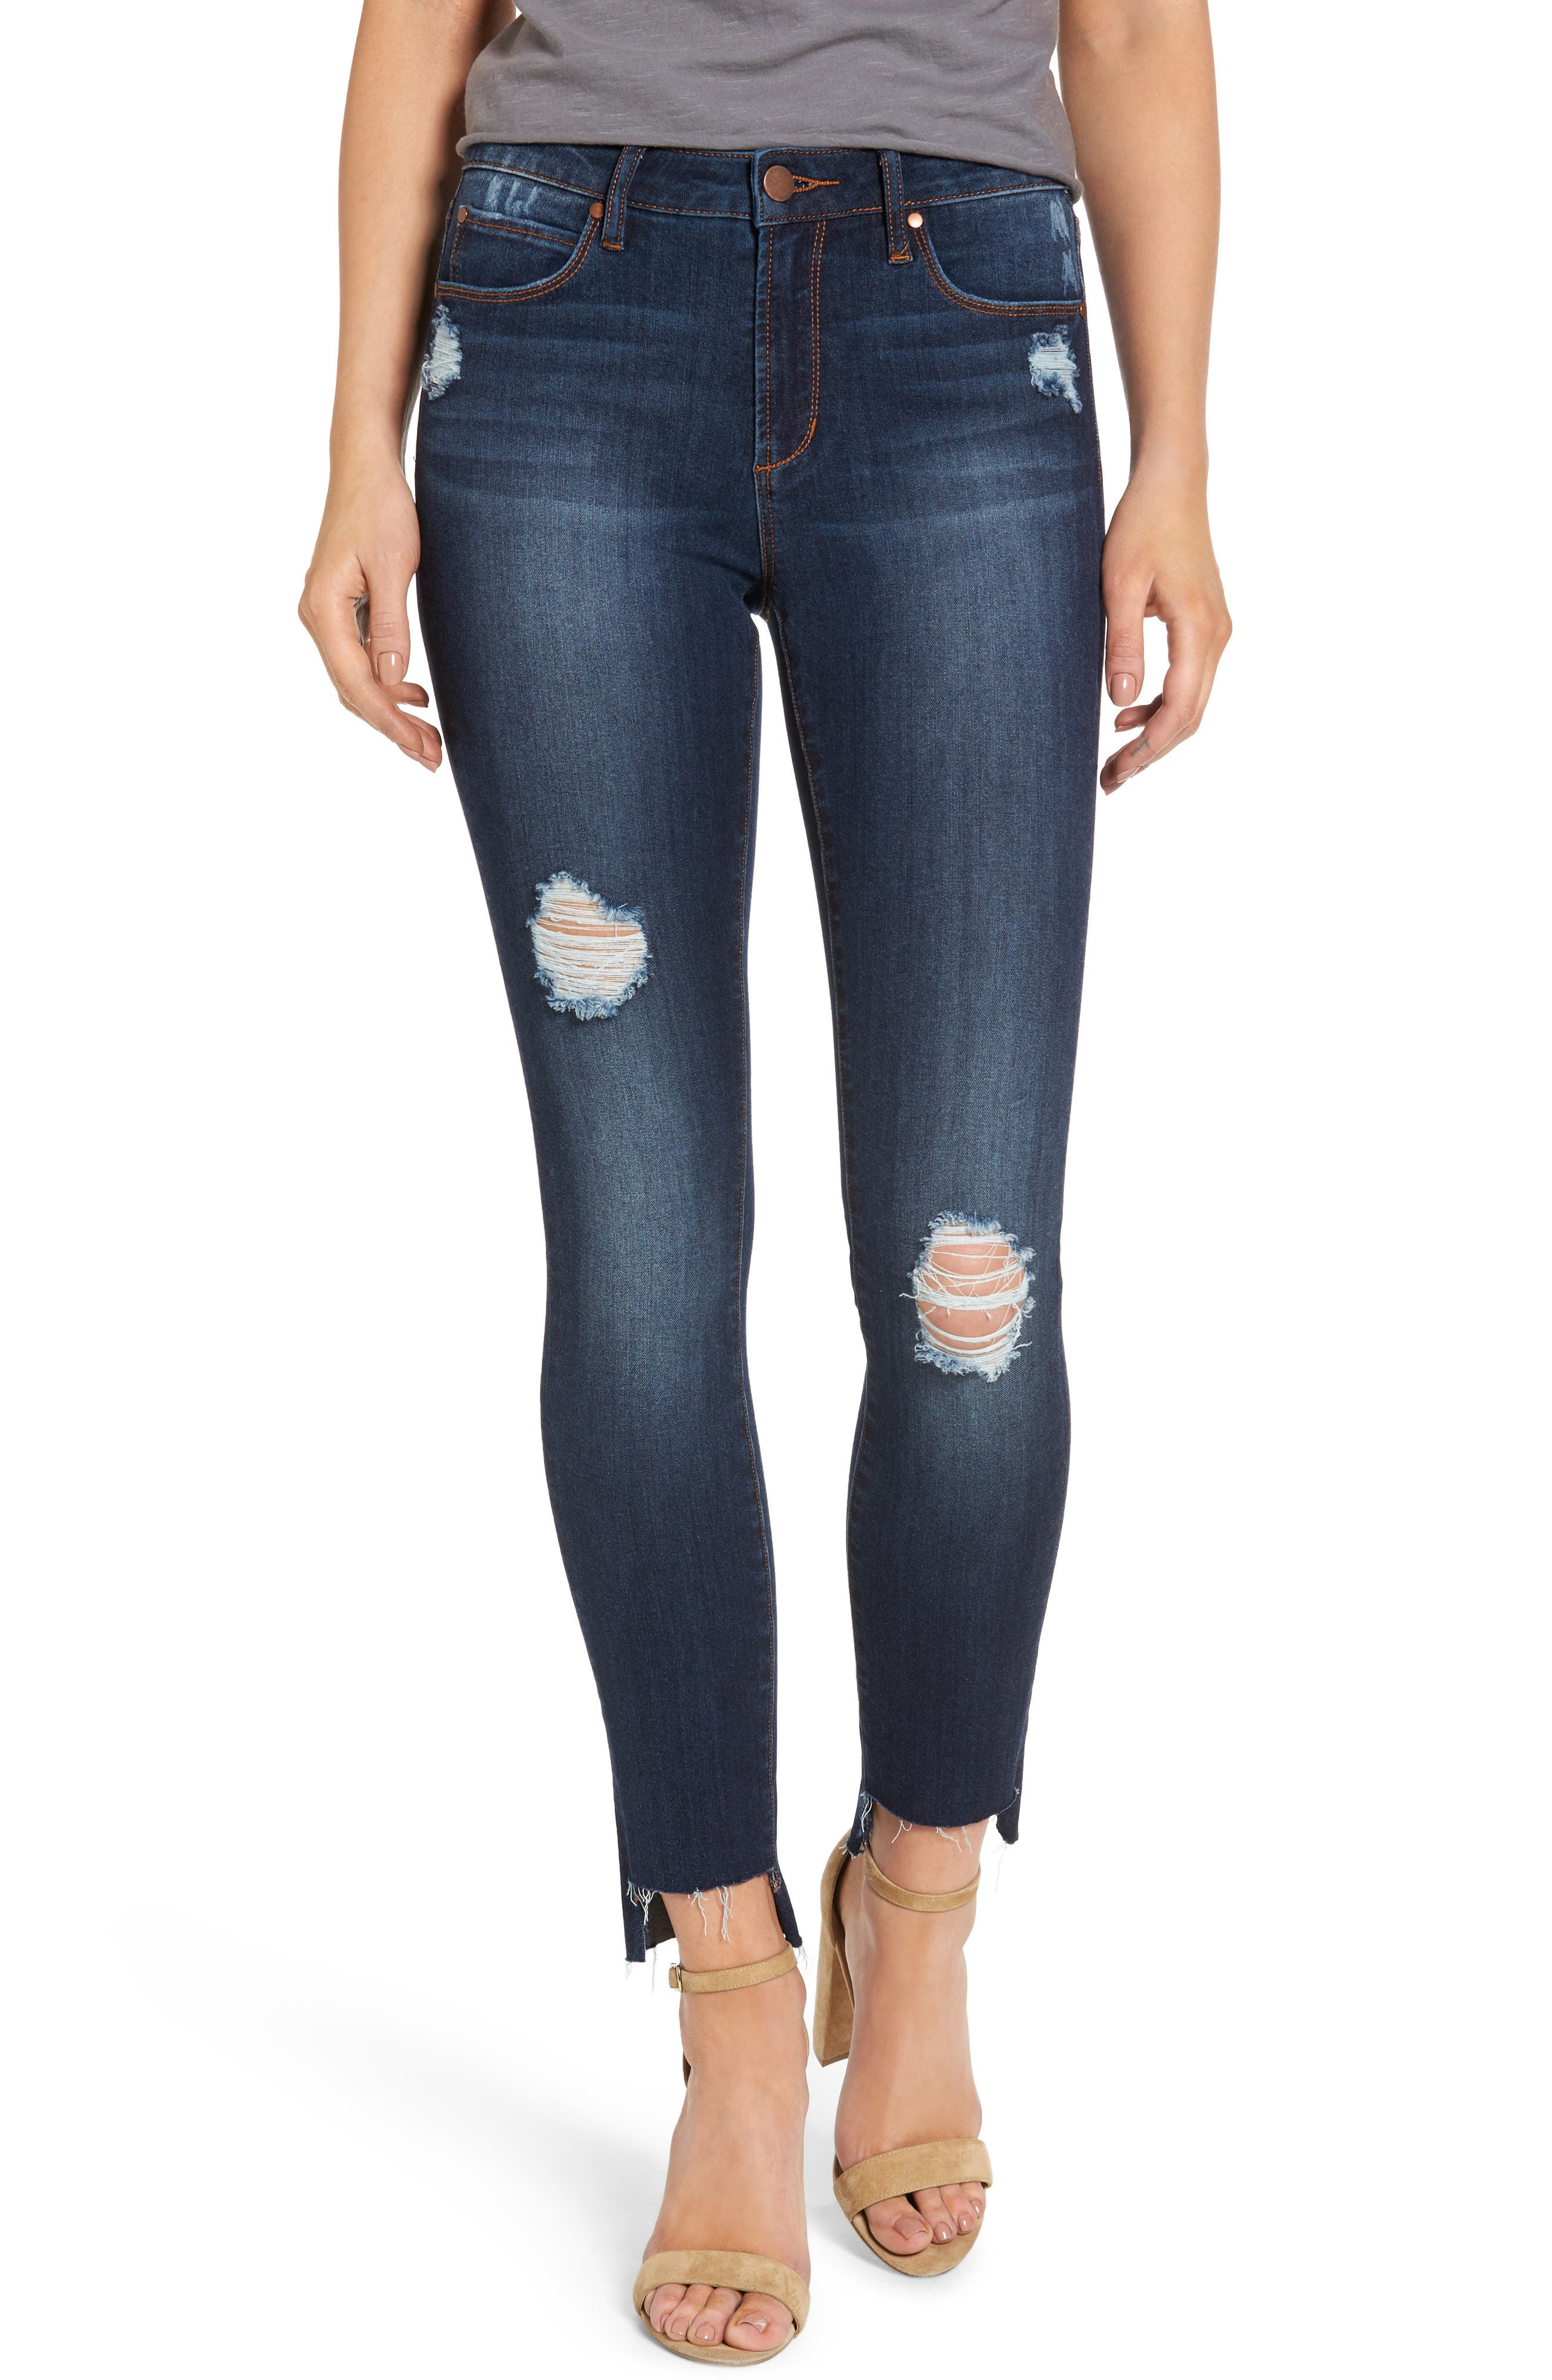 Alternate Image 1 Selected - Leith Ripped Step Hem Skinny Jeans (Destroy Medium)